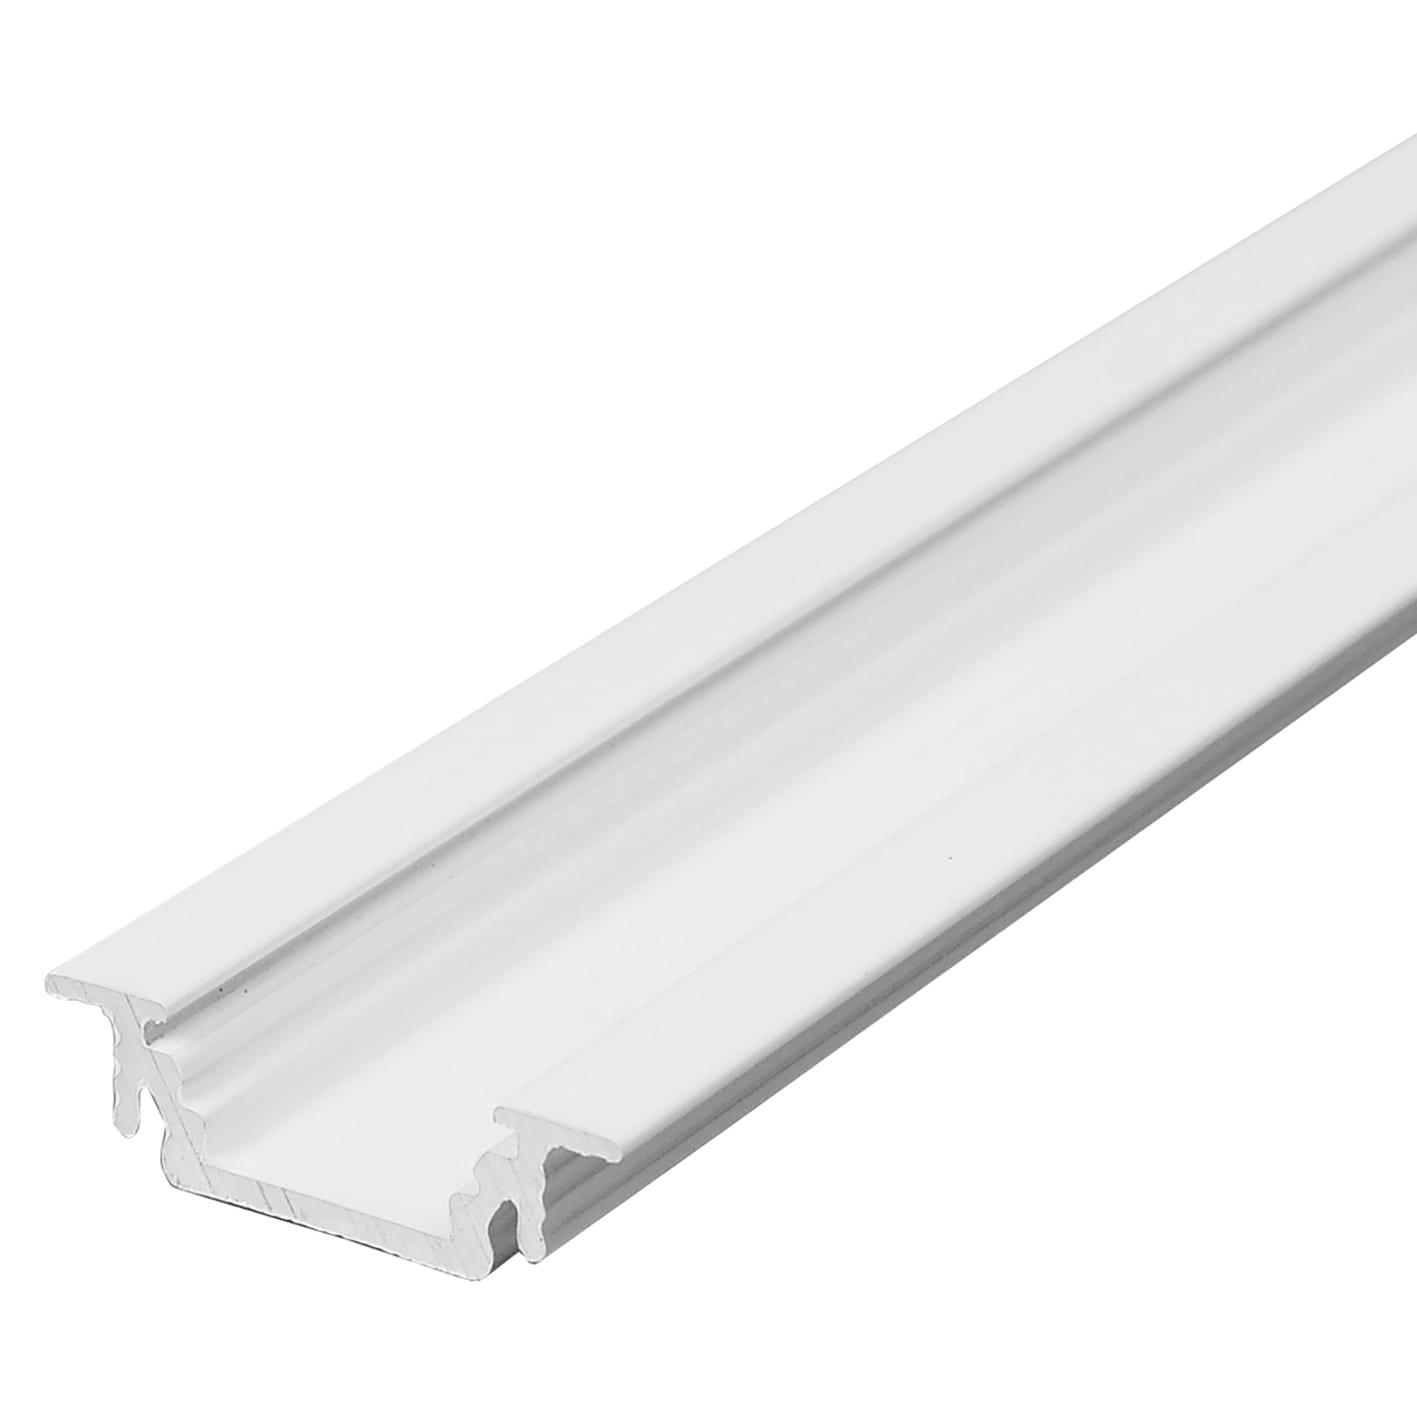 Strisce Led Per Cartongesso profilo per strisce led, in metallo, grigio / argento, 2 m